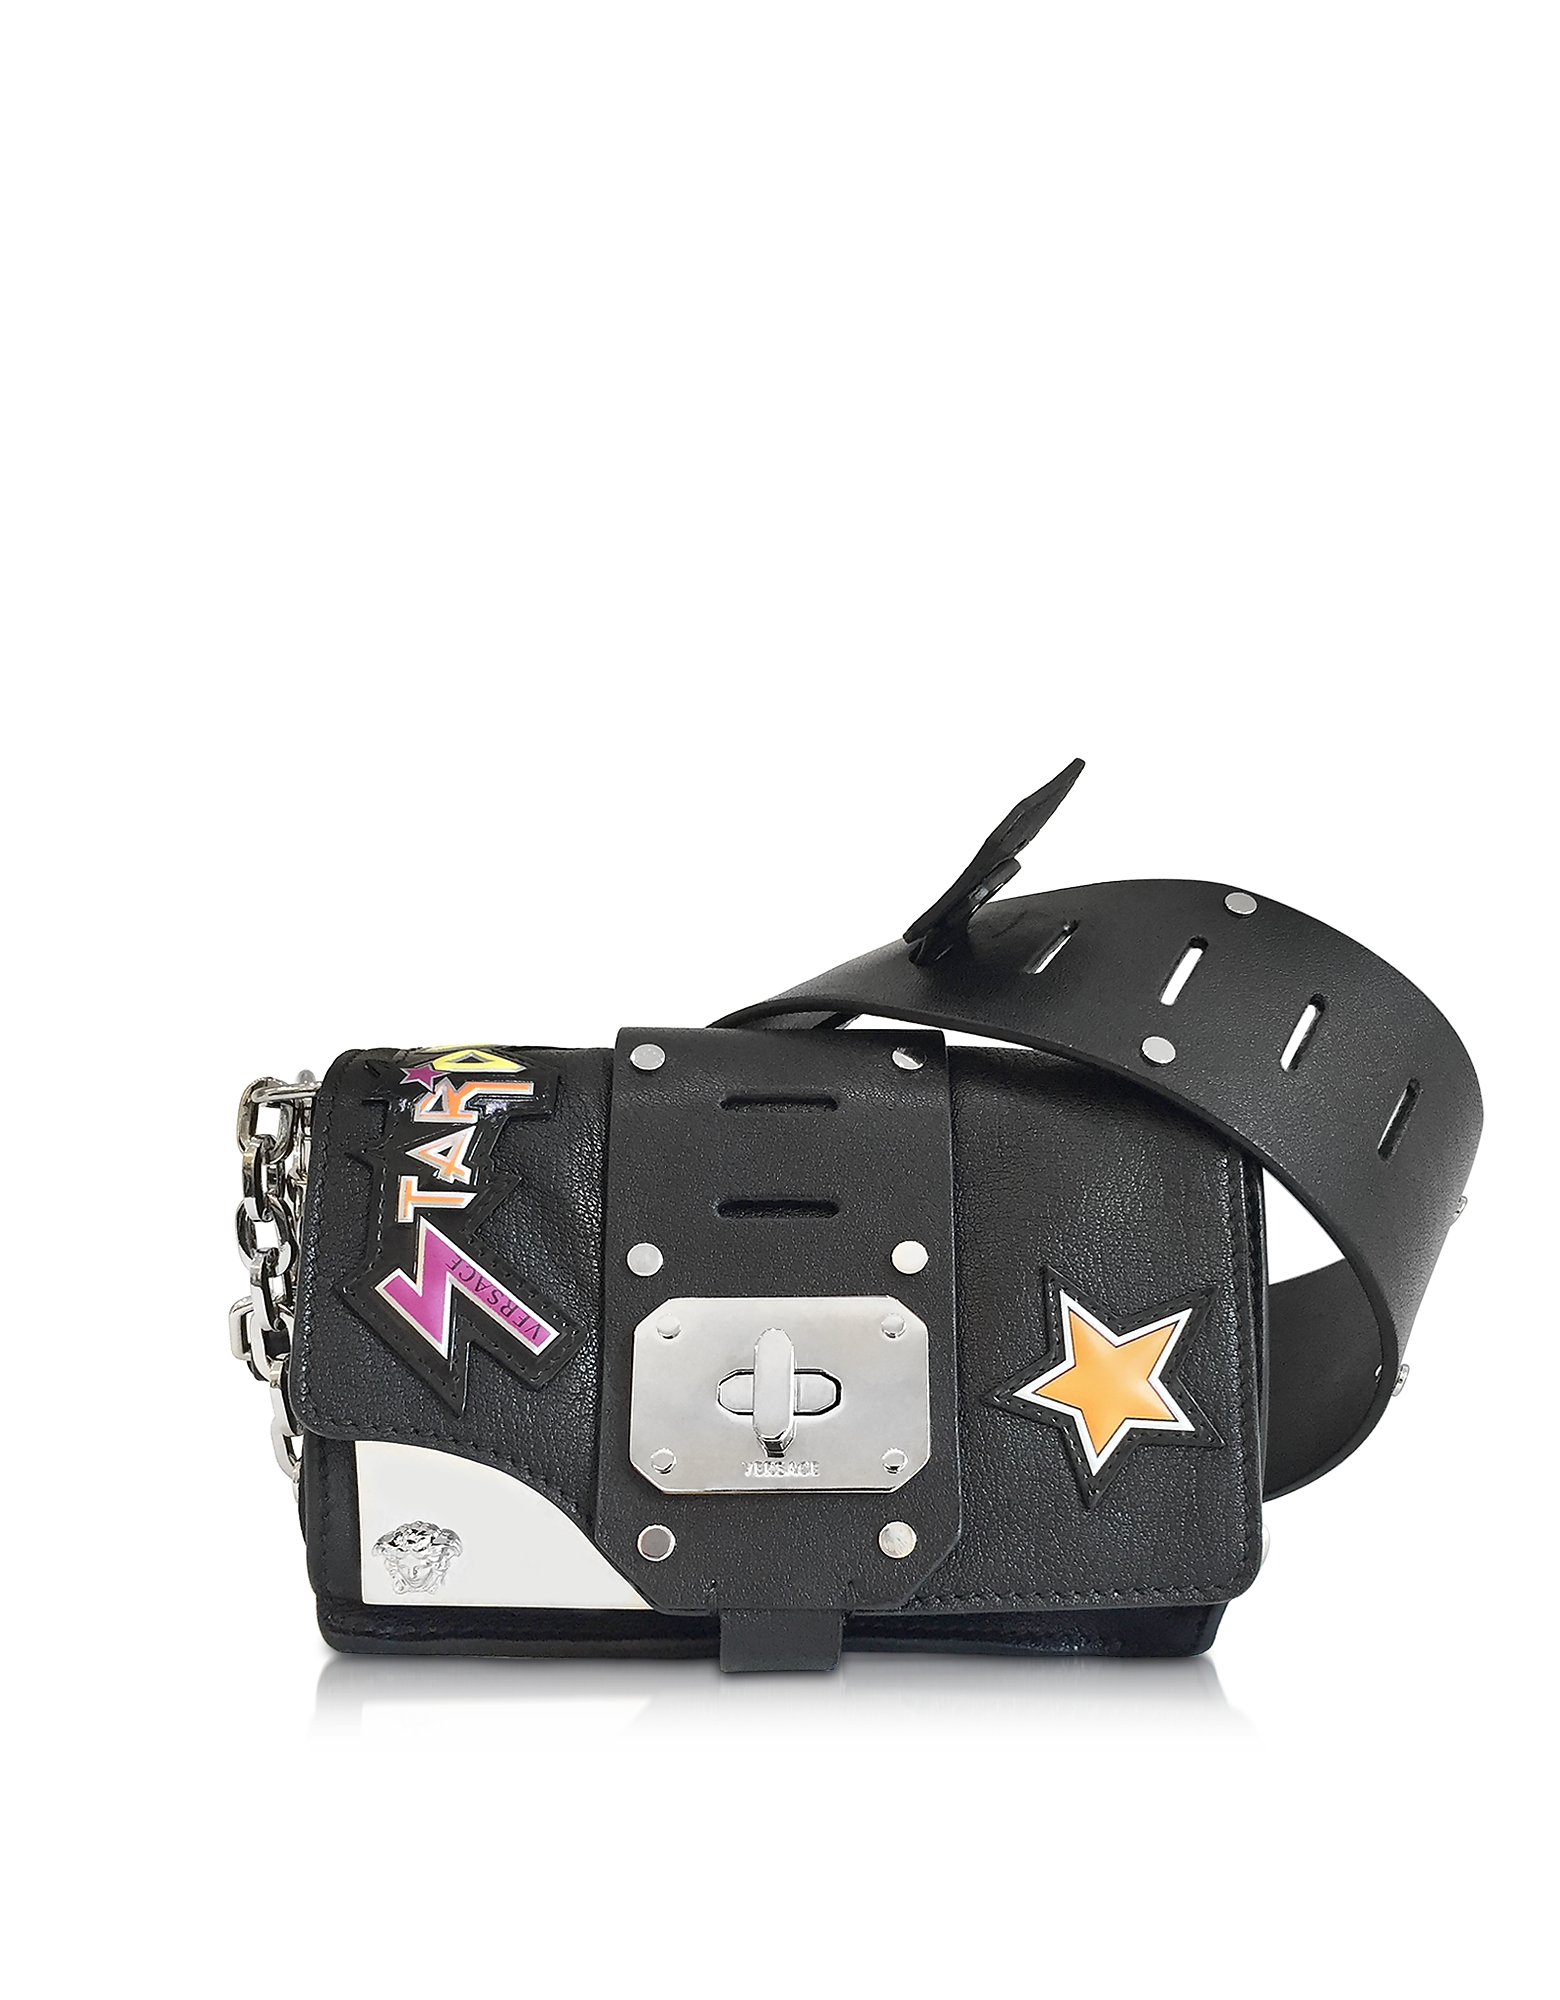 Versace Stardust - Маленькая Черная Кожаная Сумка на Плечо с Нашивками